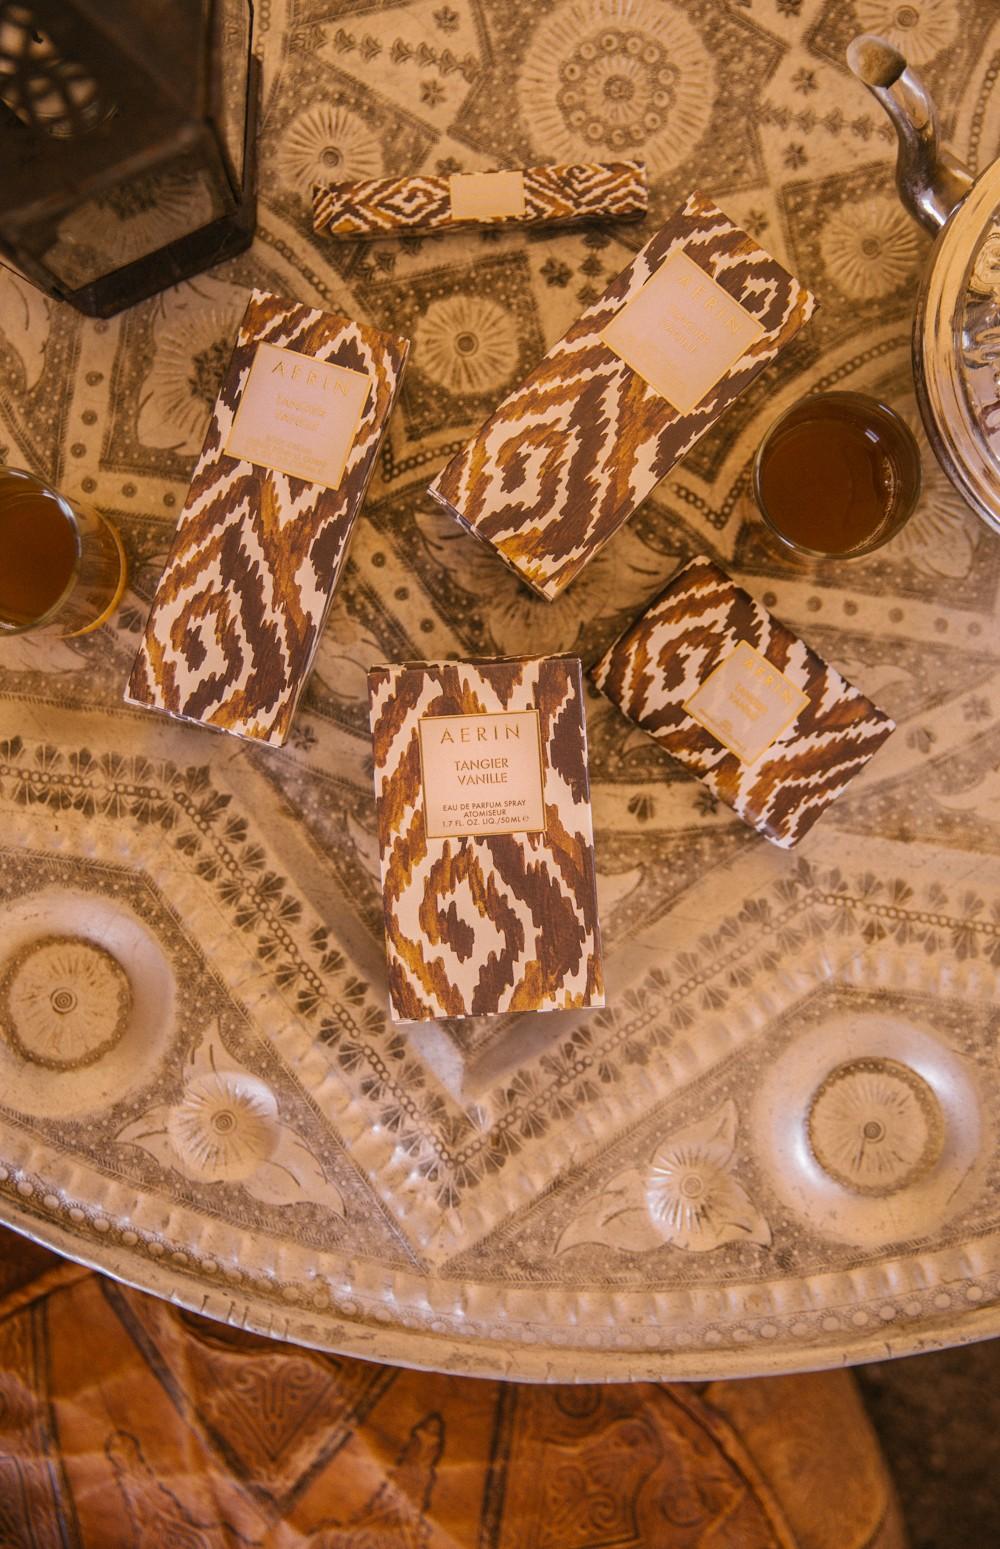 Mint tea and Aerin goodies